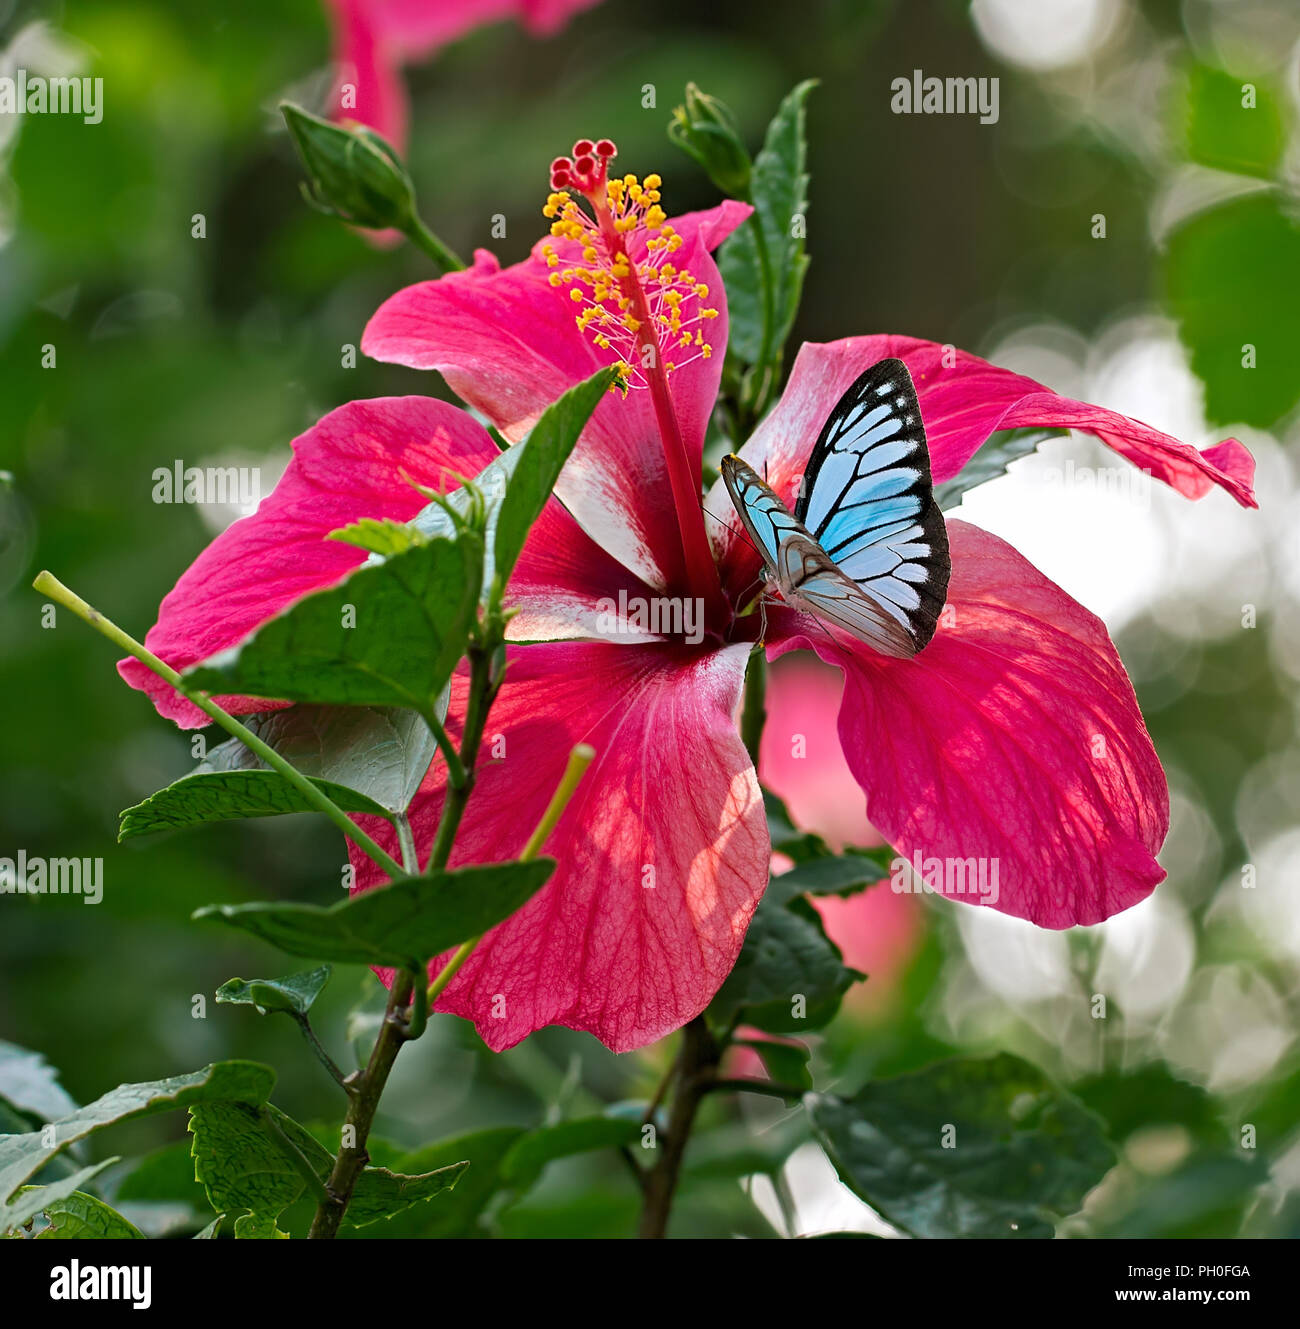 Mariposa Azul Pareronia valeria o vagabundo, el común de la familia Pieridae, sobre una flor rosa Hibiscus rosa-sinensis. Imagen De Stock